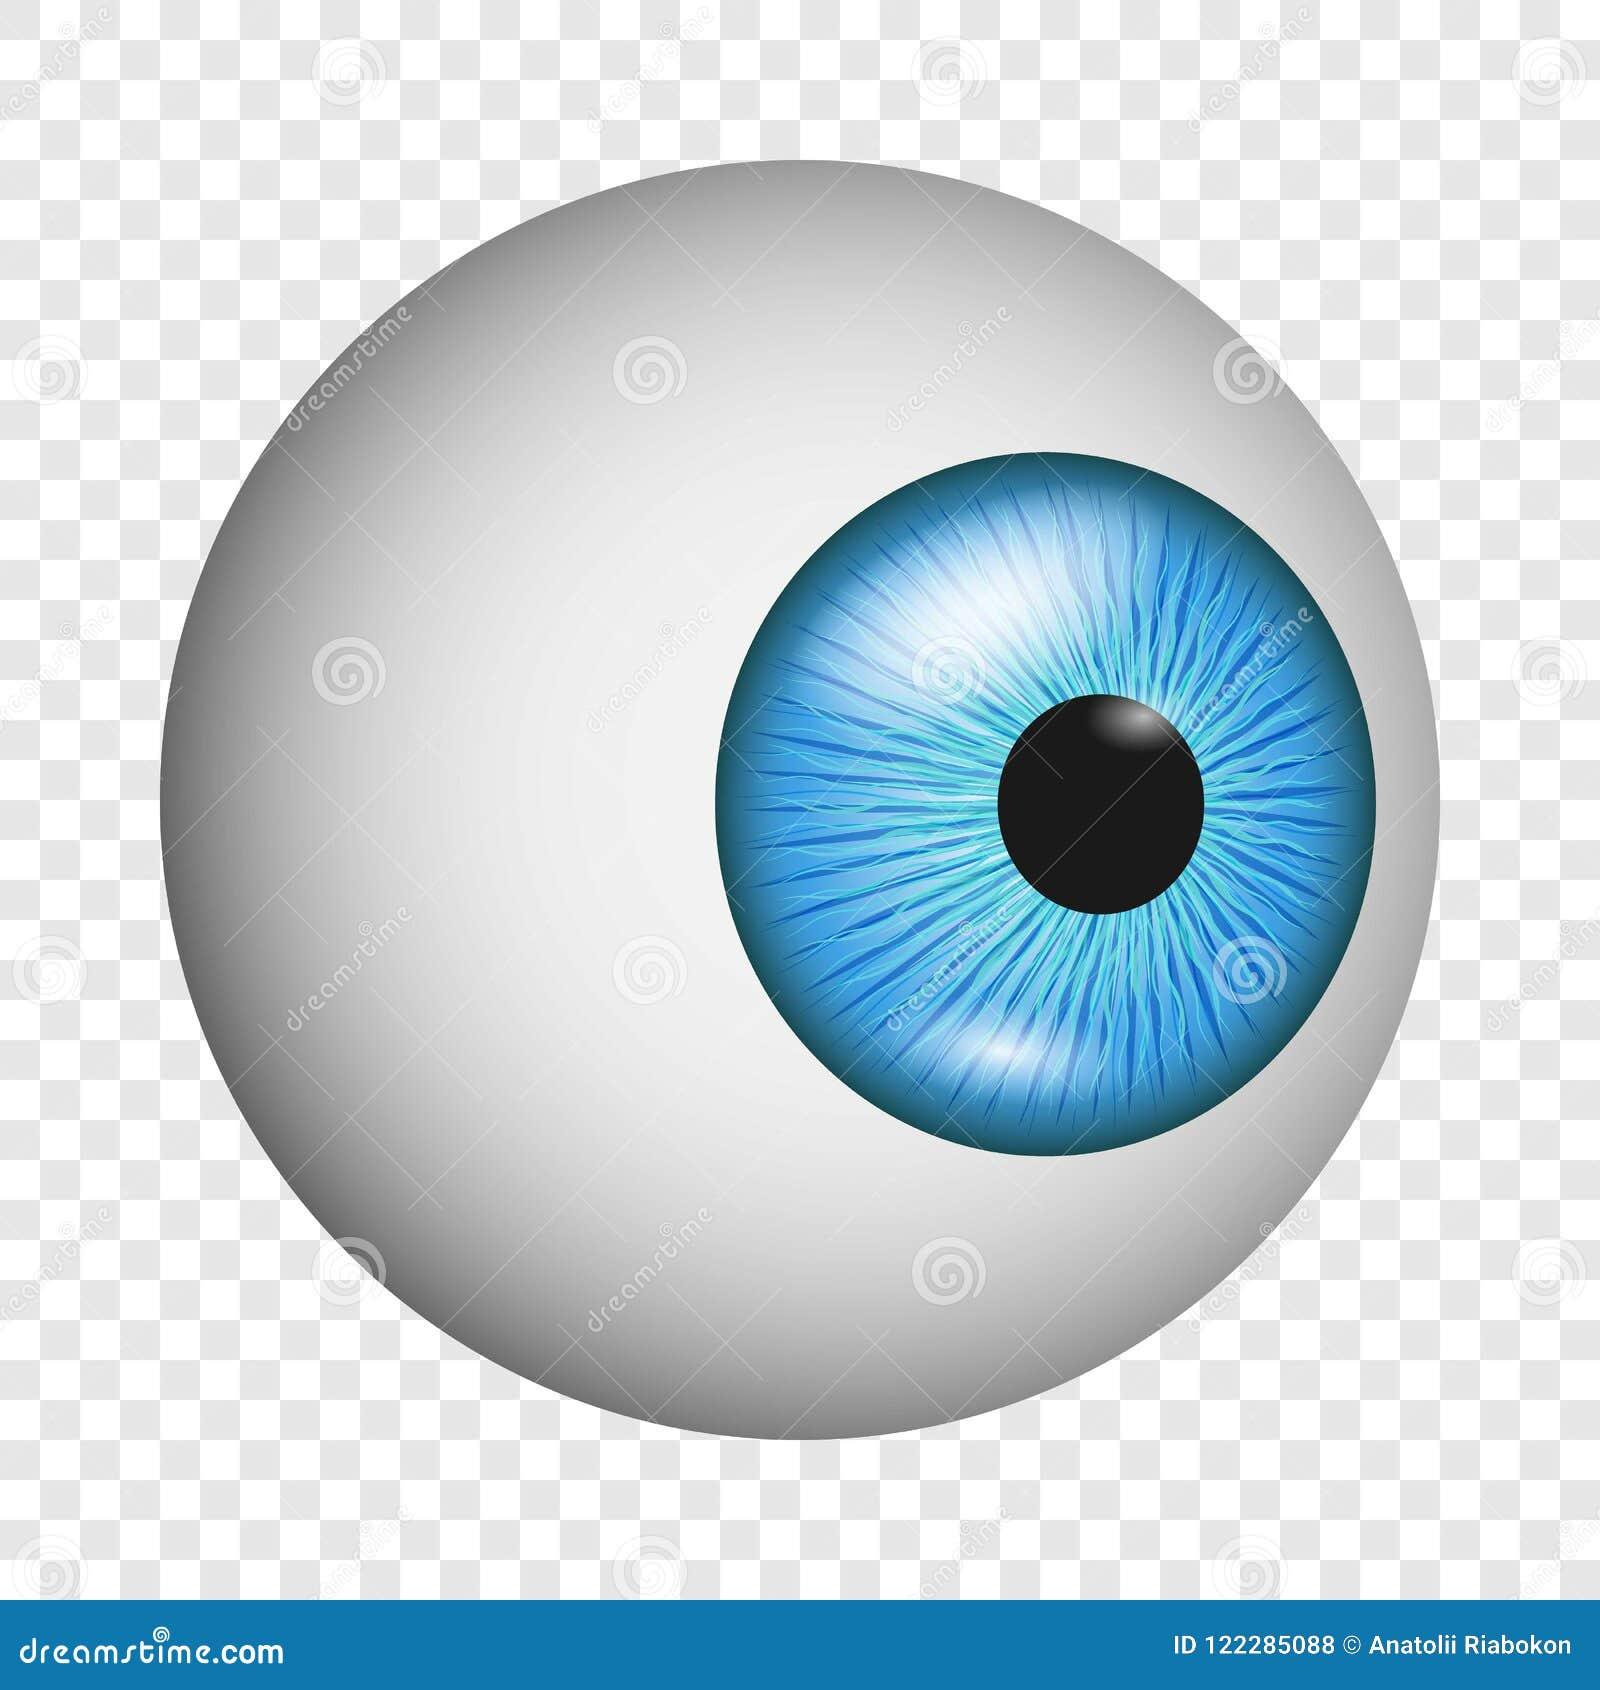 Eye Anatomy Icon, Realistic Style Stock Vector - Illustration of ...